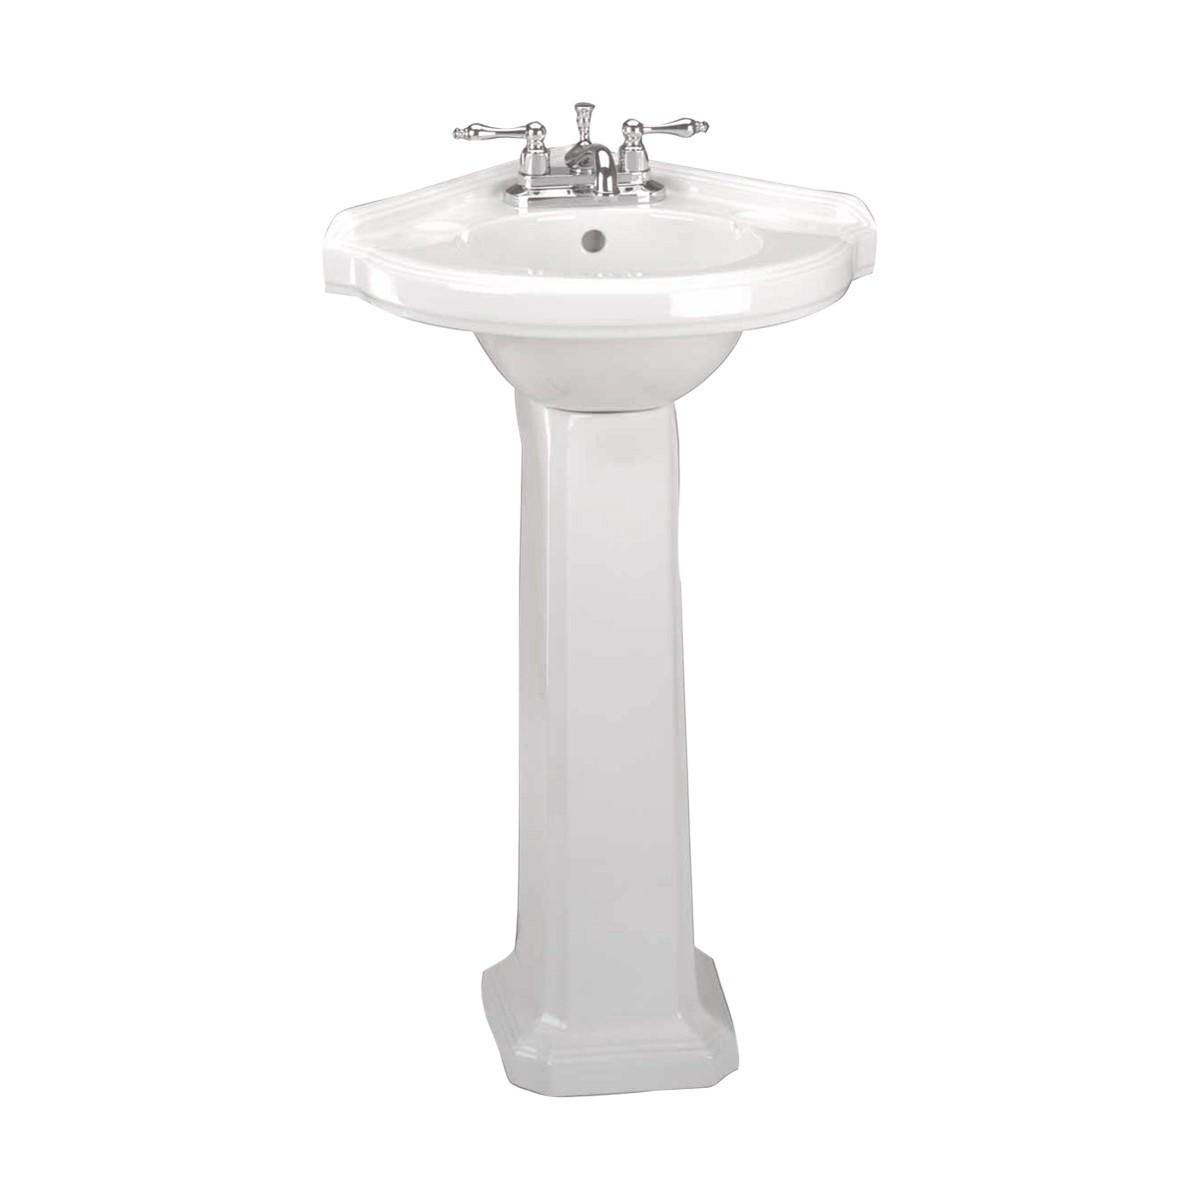 cadet pedestal inch standard sinks sink bathroom american